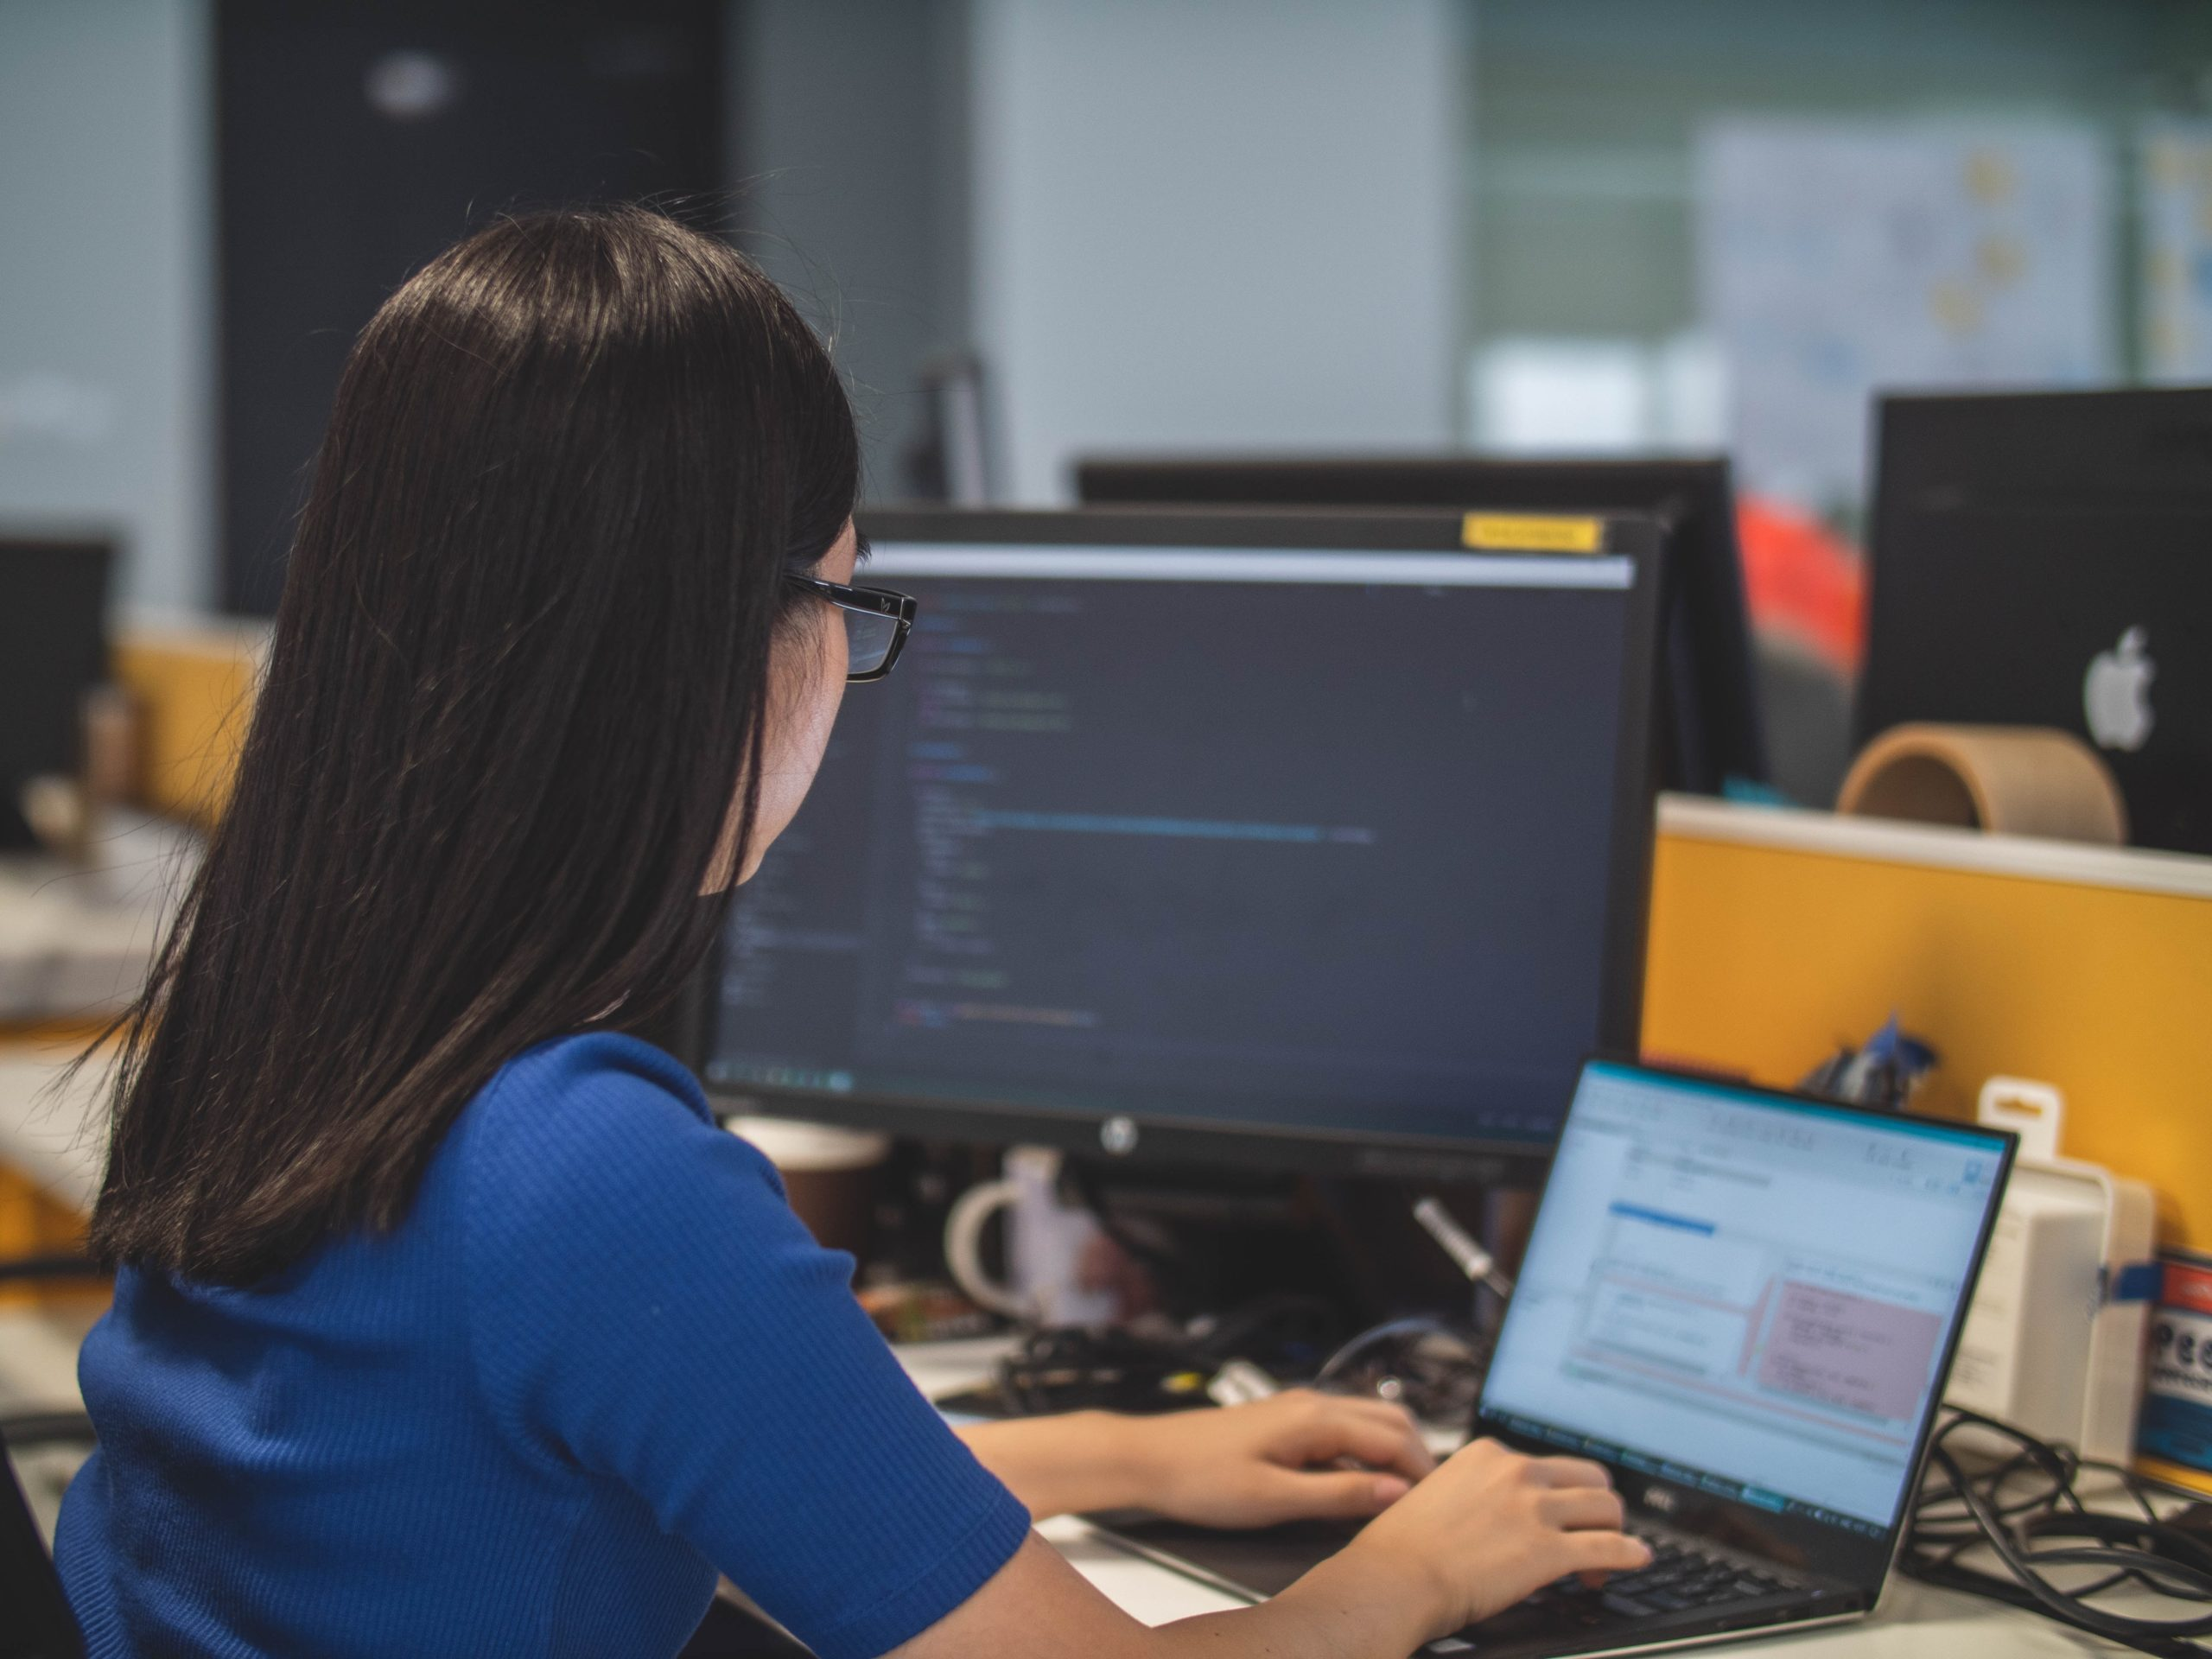 Representation Matters: Women in Technology